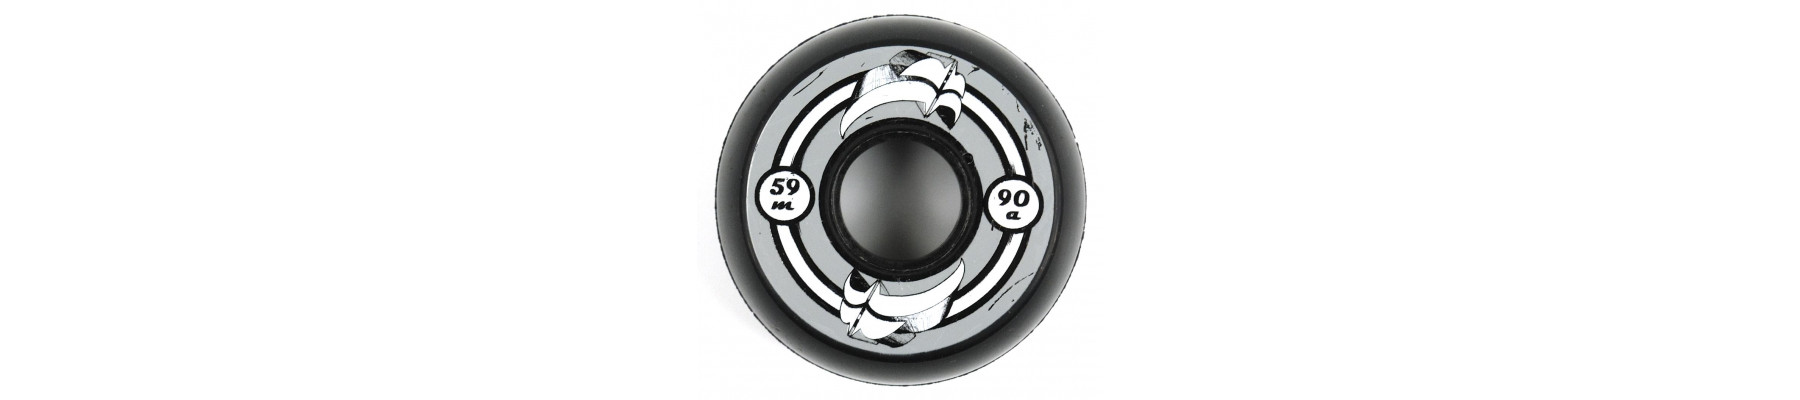 Razors Black 90A